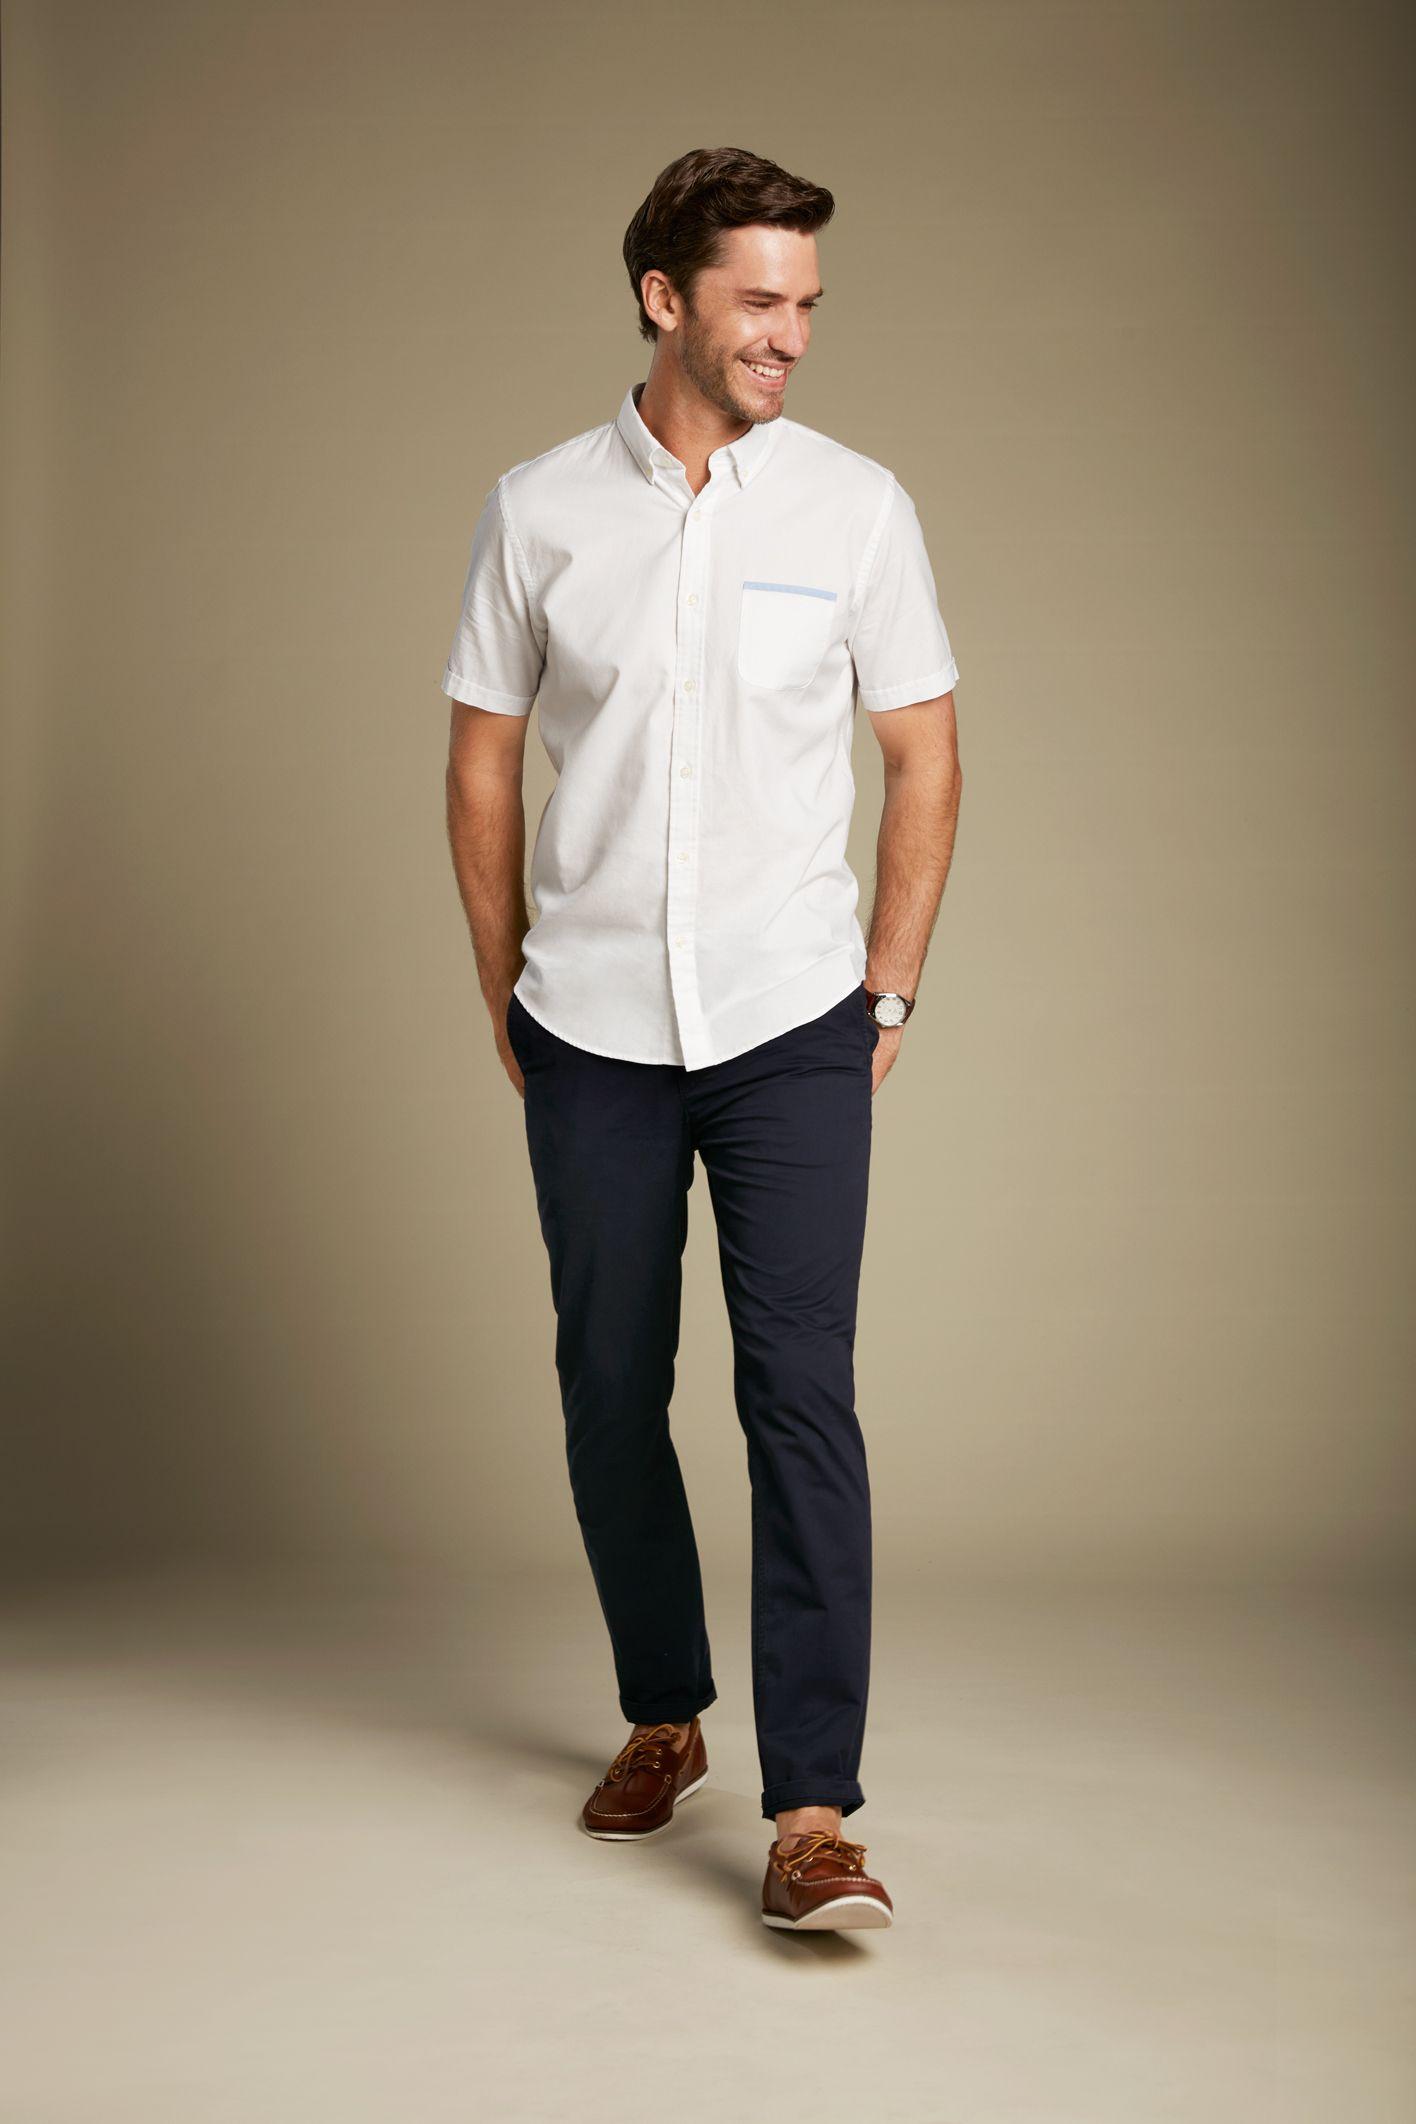 Australian Autumn Men's Fashion Short Sleeve Shirt Chinos   Short ...